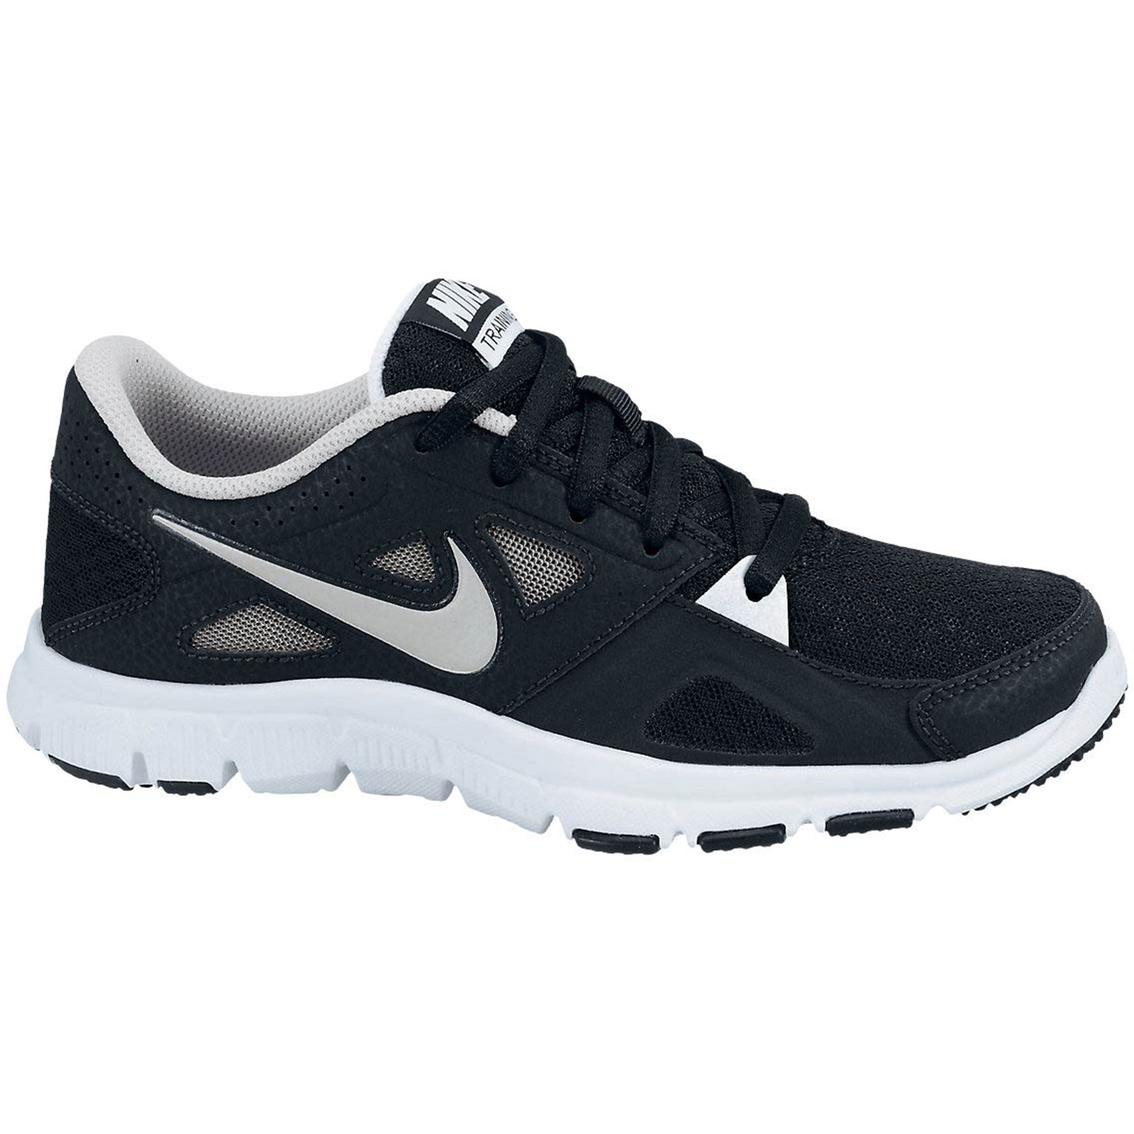 nike black shoes for school thehoneycombimaging co uk